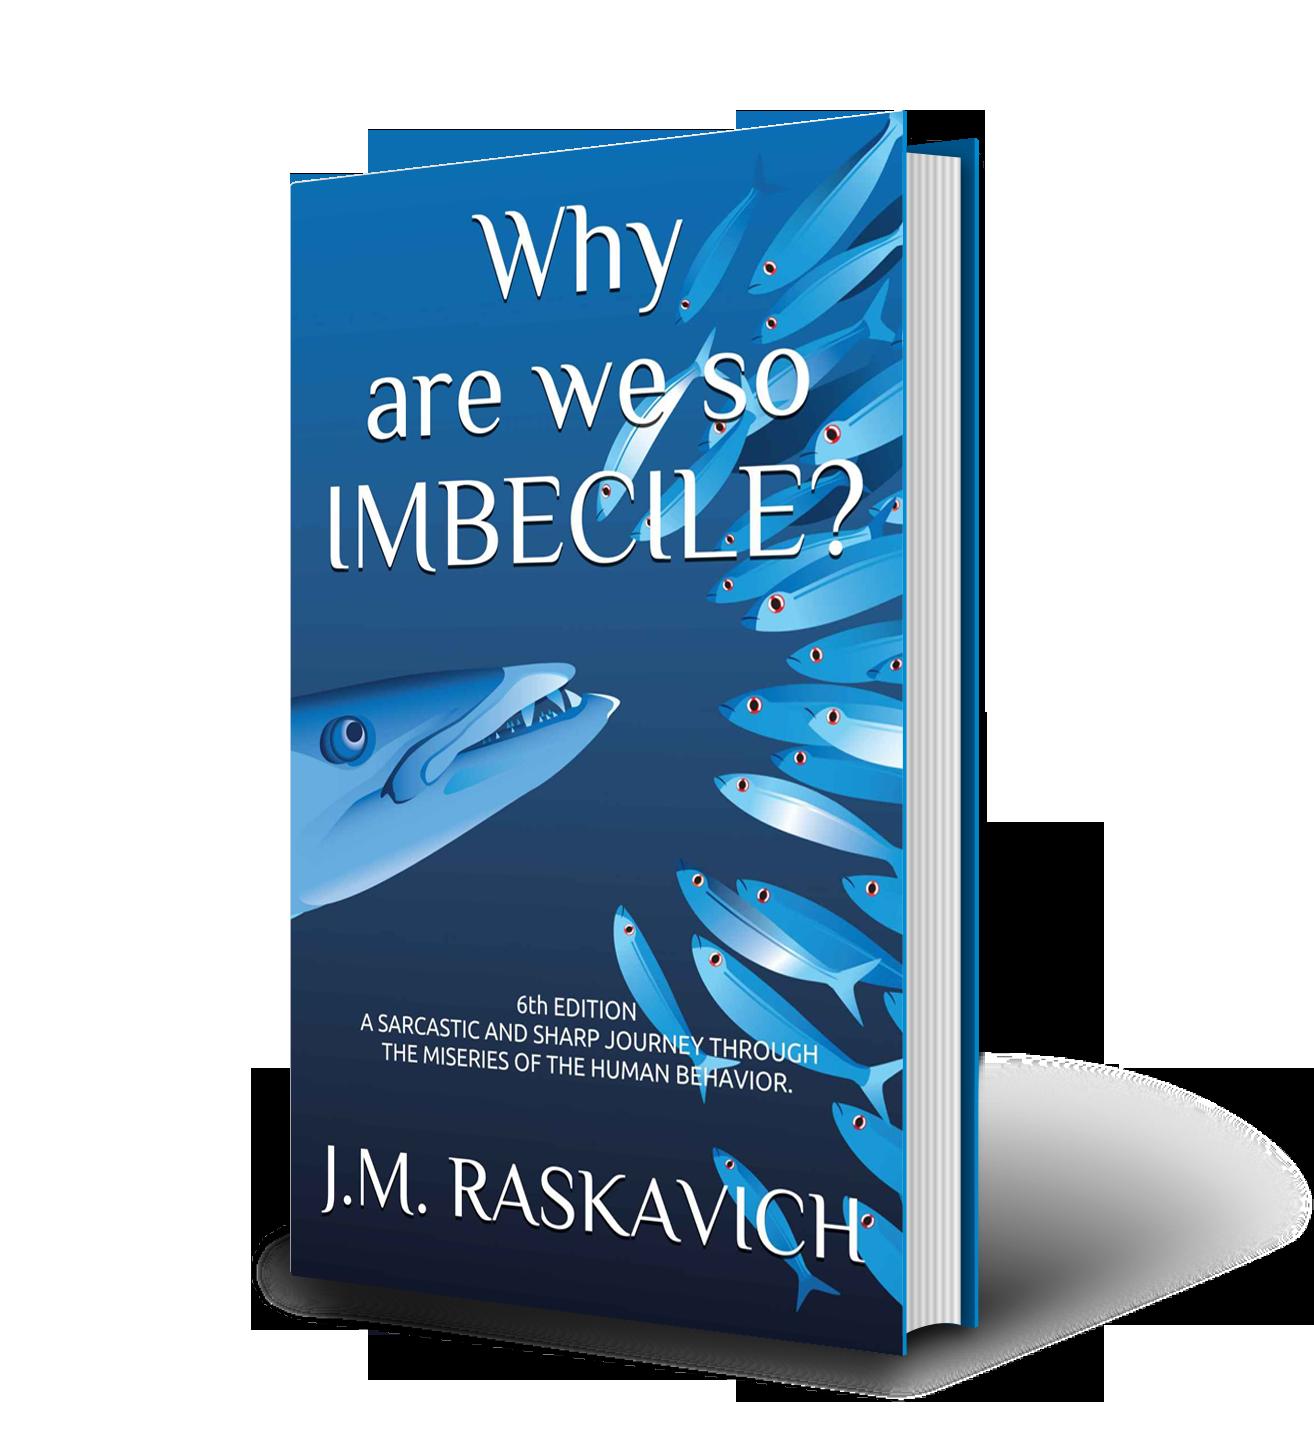 Libro de crítica social-Book-Why are we so imbecile? 6th Edition